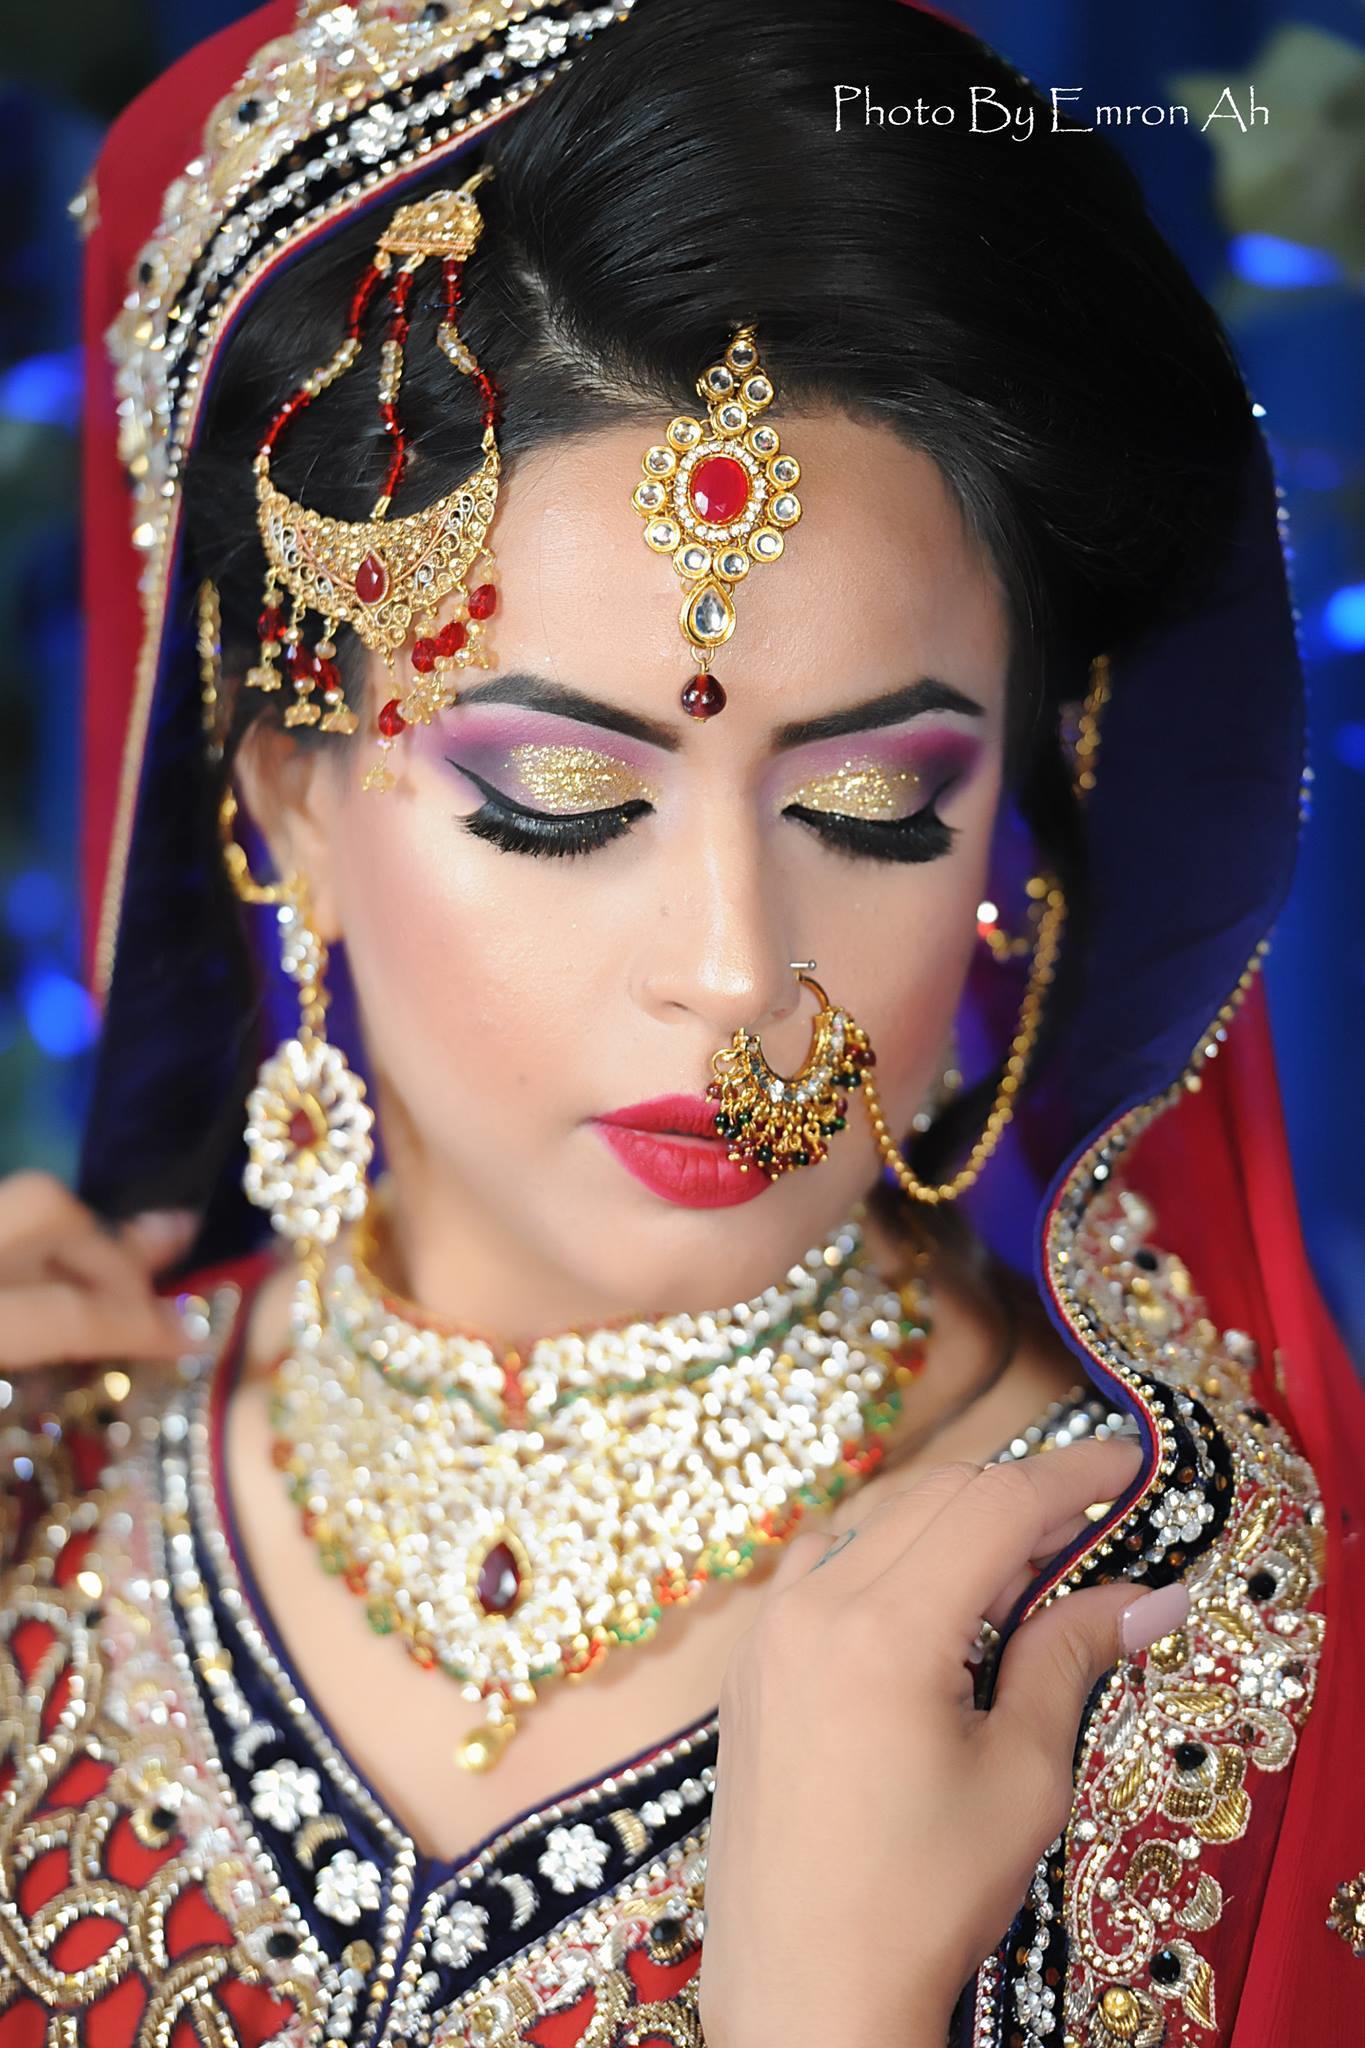 S.Ozair Beauty Salon image 9